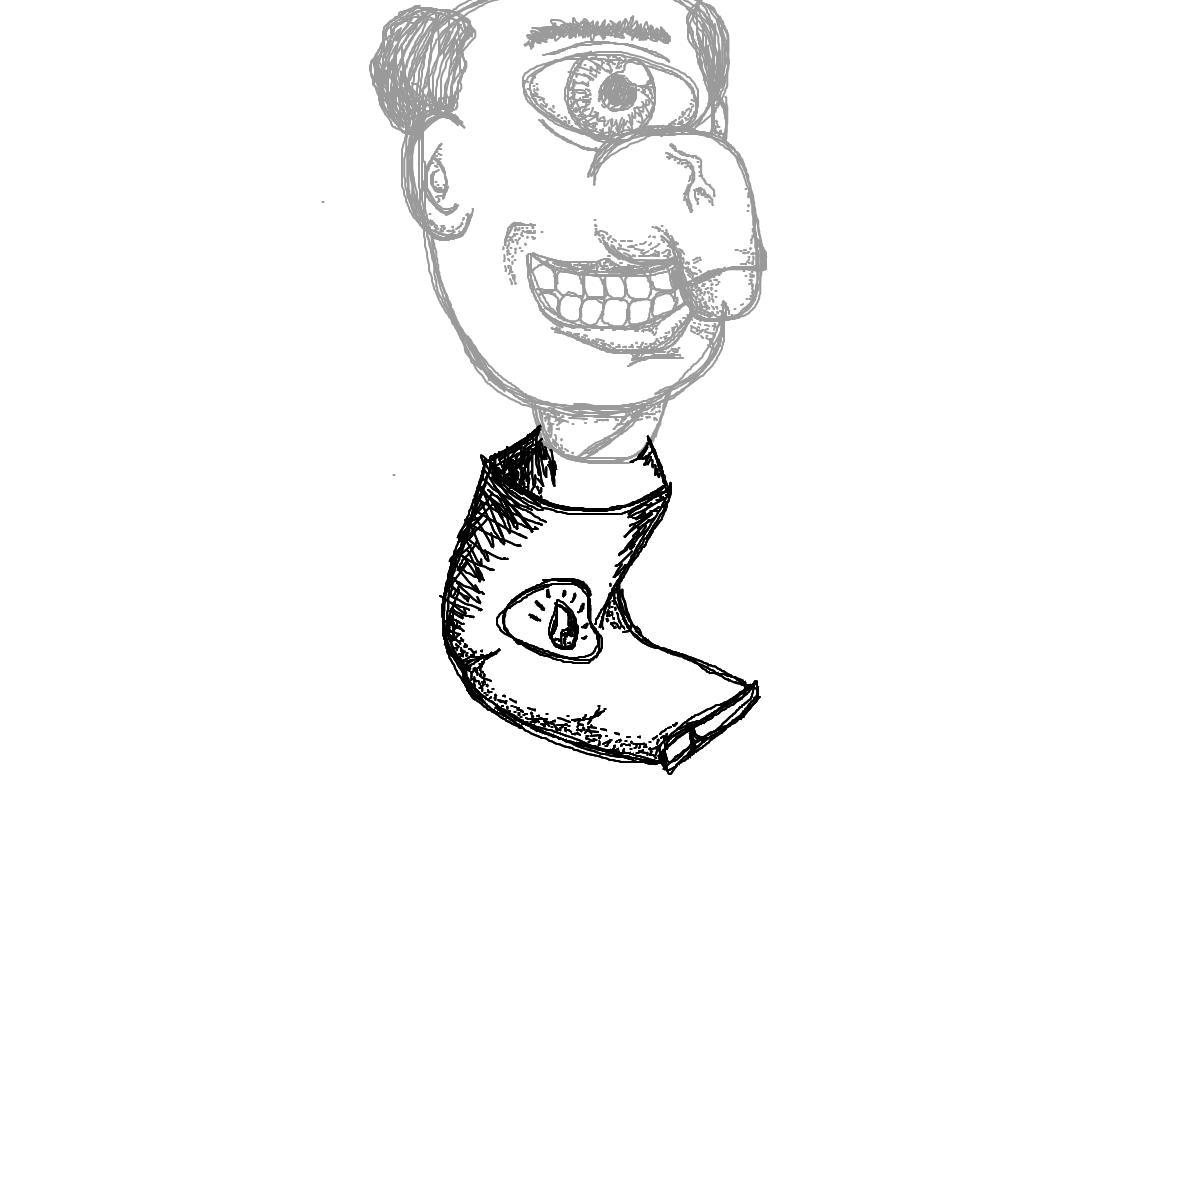 BAAAM drawing#2093 lat:43.3356781005859400lng: -1.9728782176971436